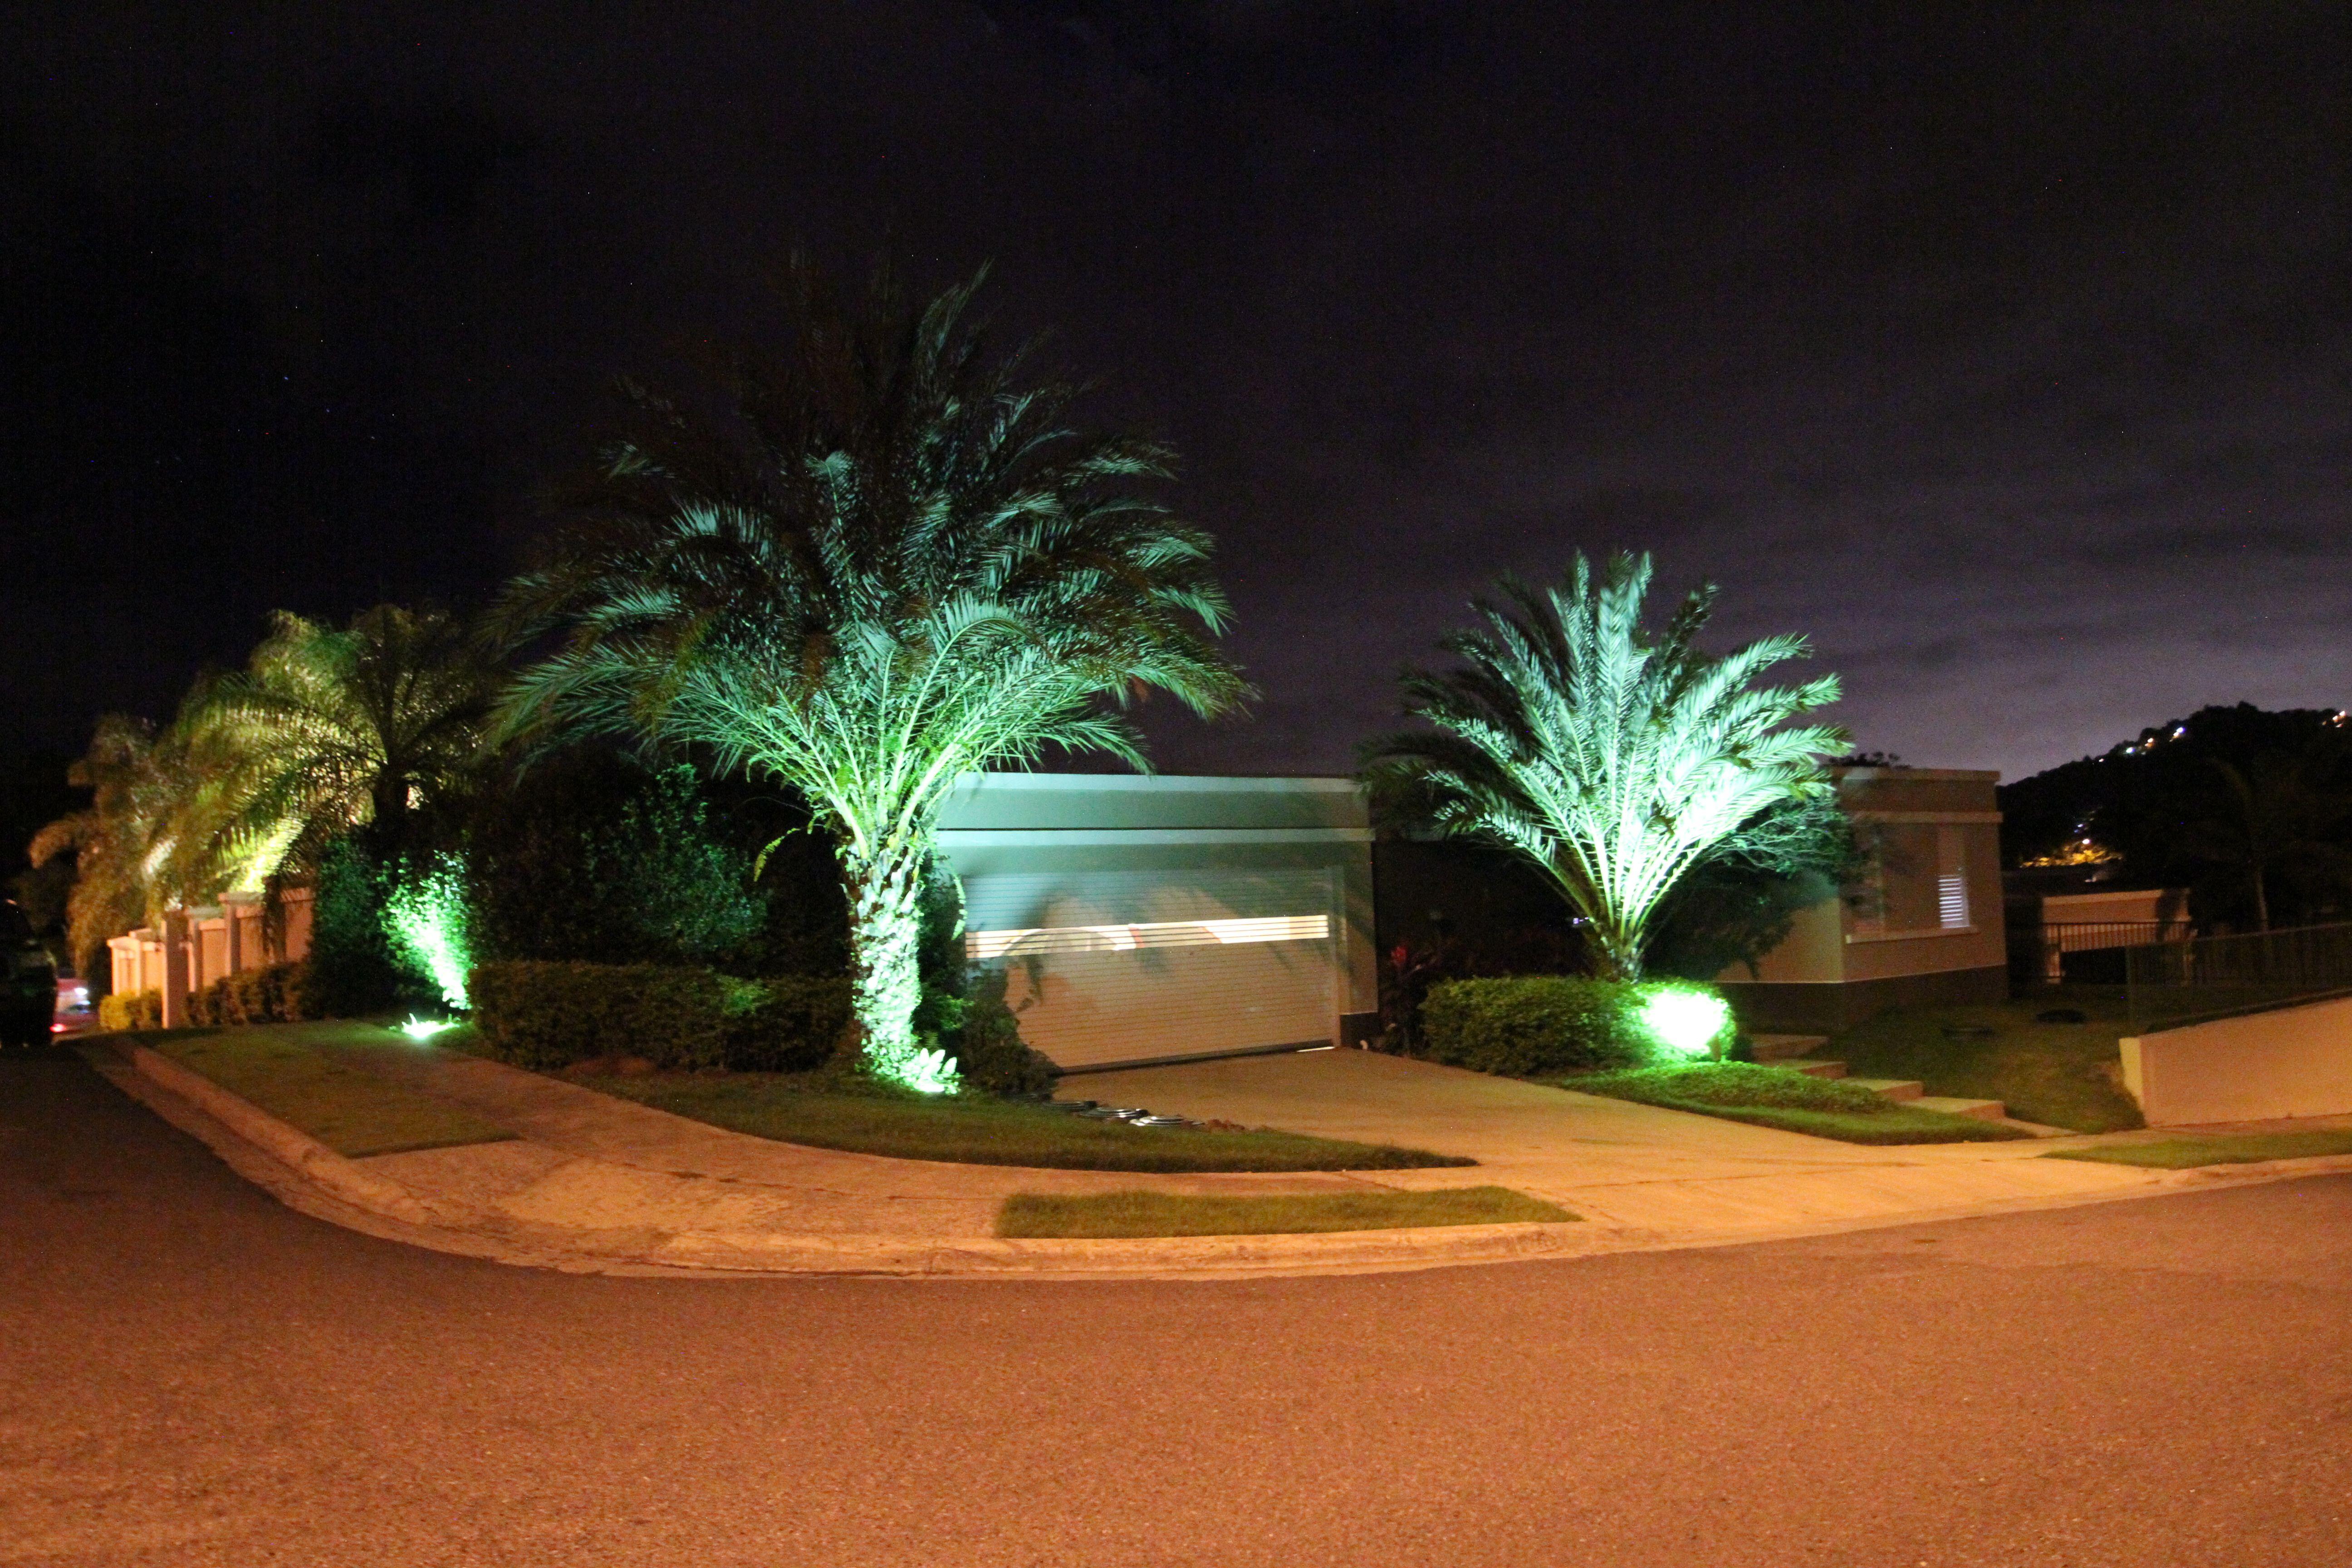 Iluminaci n de jard n por greenscapes - Iluminacion led jardin ...